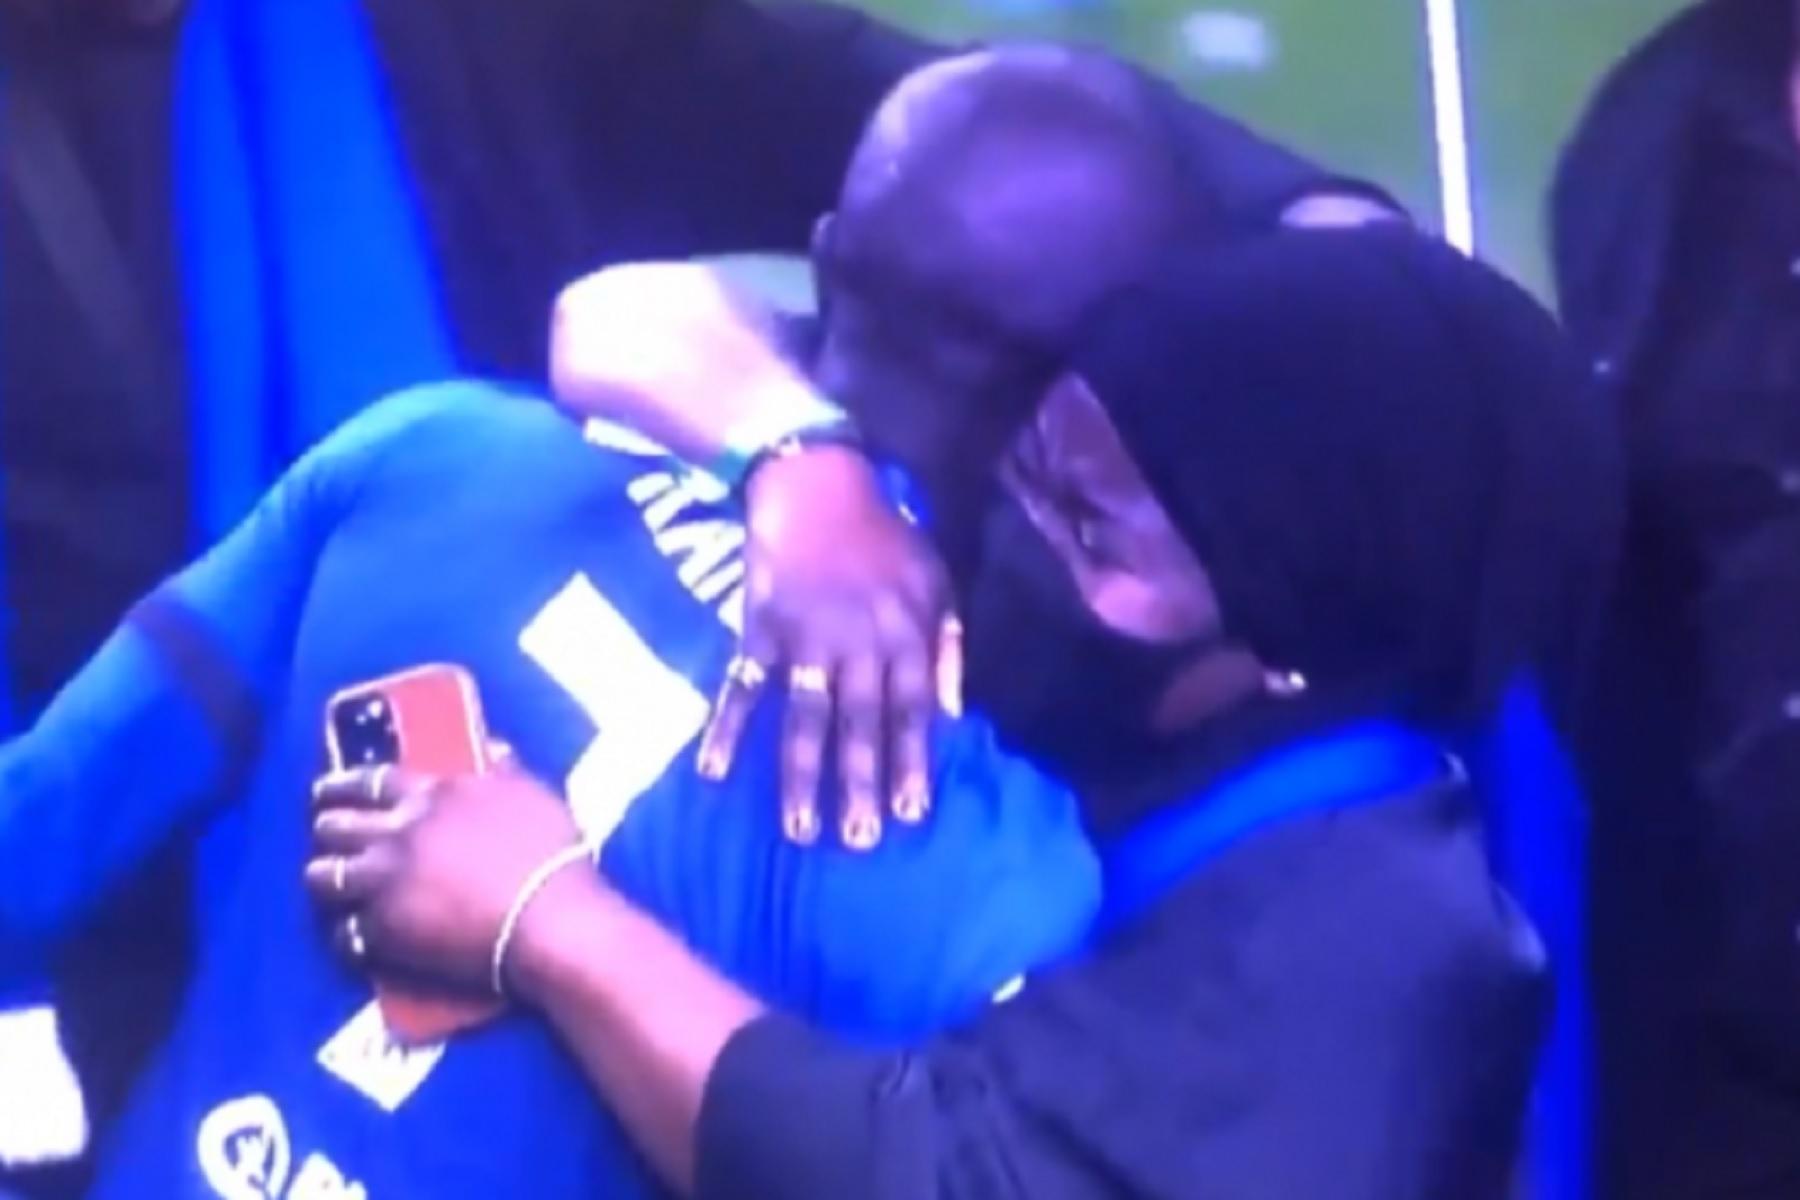 Champions League: Η τρυφερή στιγμή του MVP του τελικού με την μητέρα του